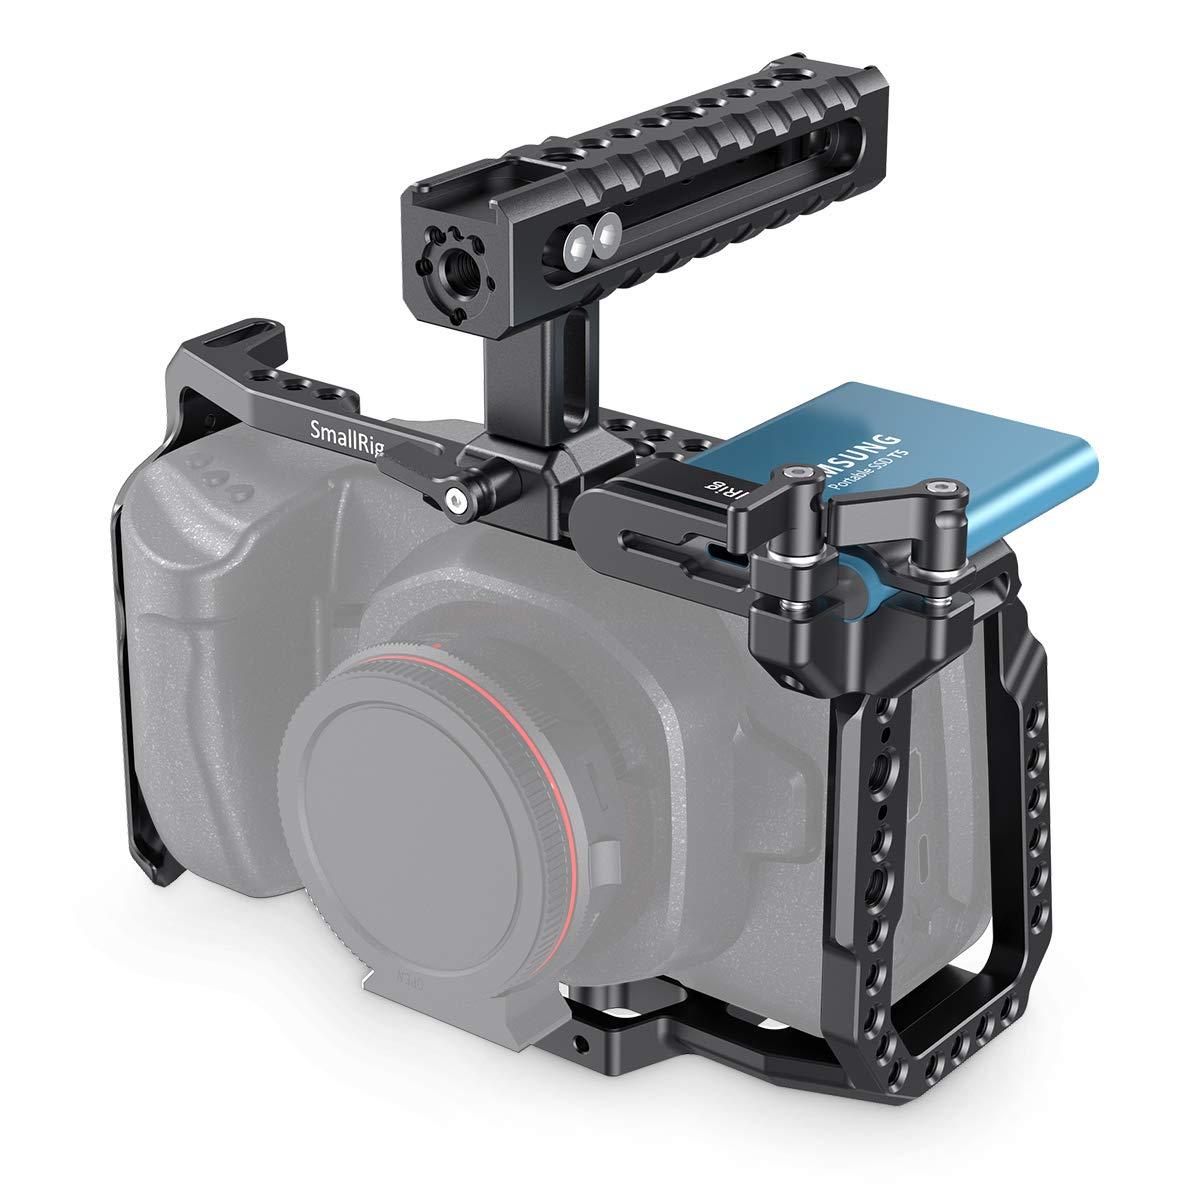 SMALLRIG Camera Cage Kit for Blackmagic Design Pocket Cinema Camera 4K & 6K, Compatible with BMPCC 4K & 6K - KCVB2419 by SMALLRIG